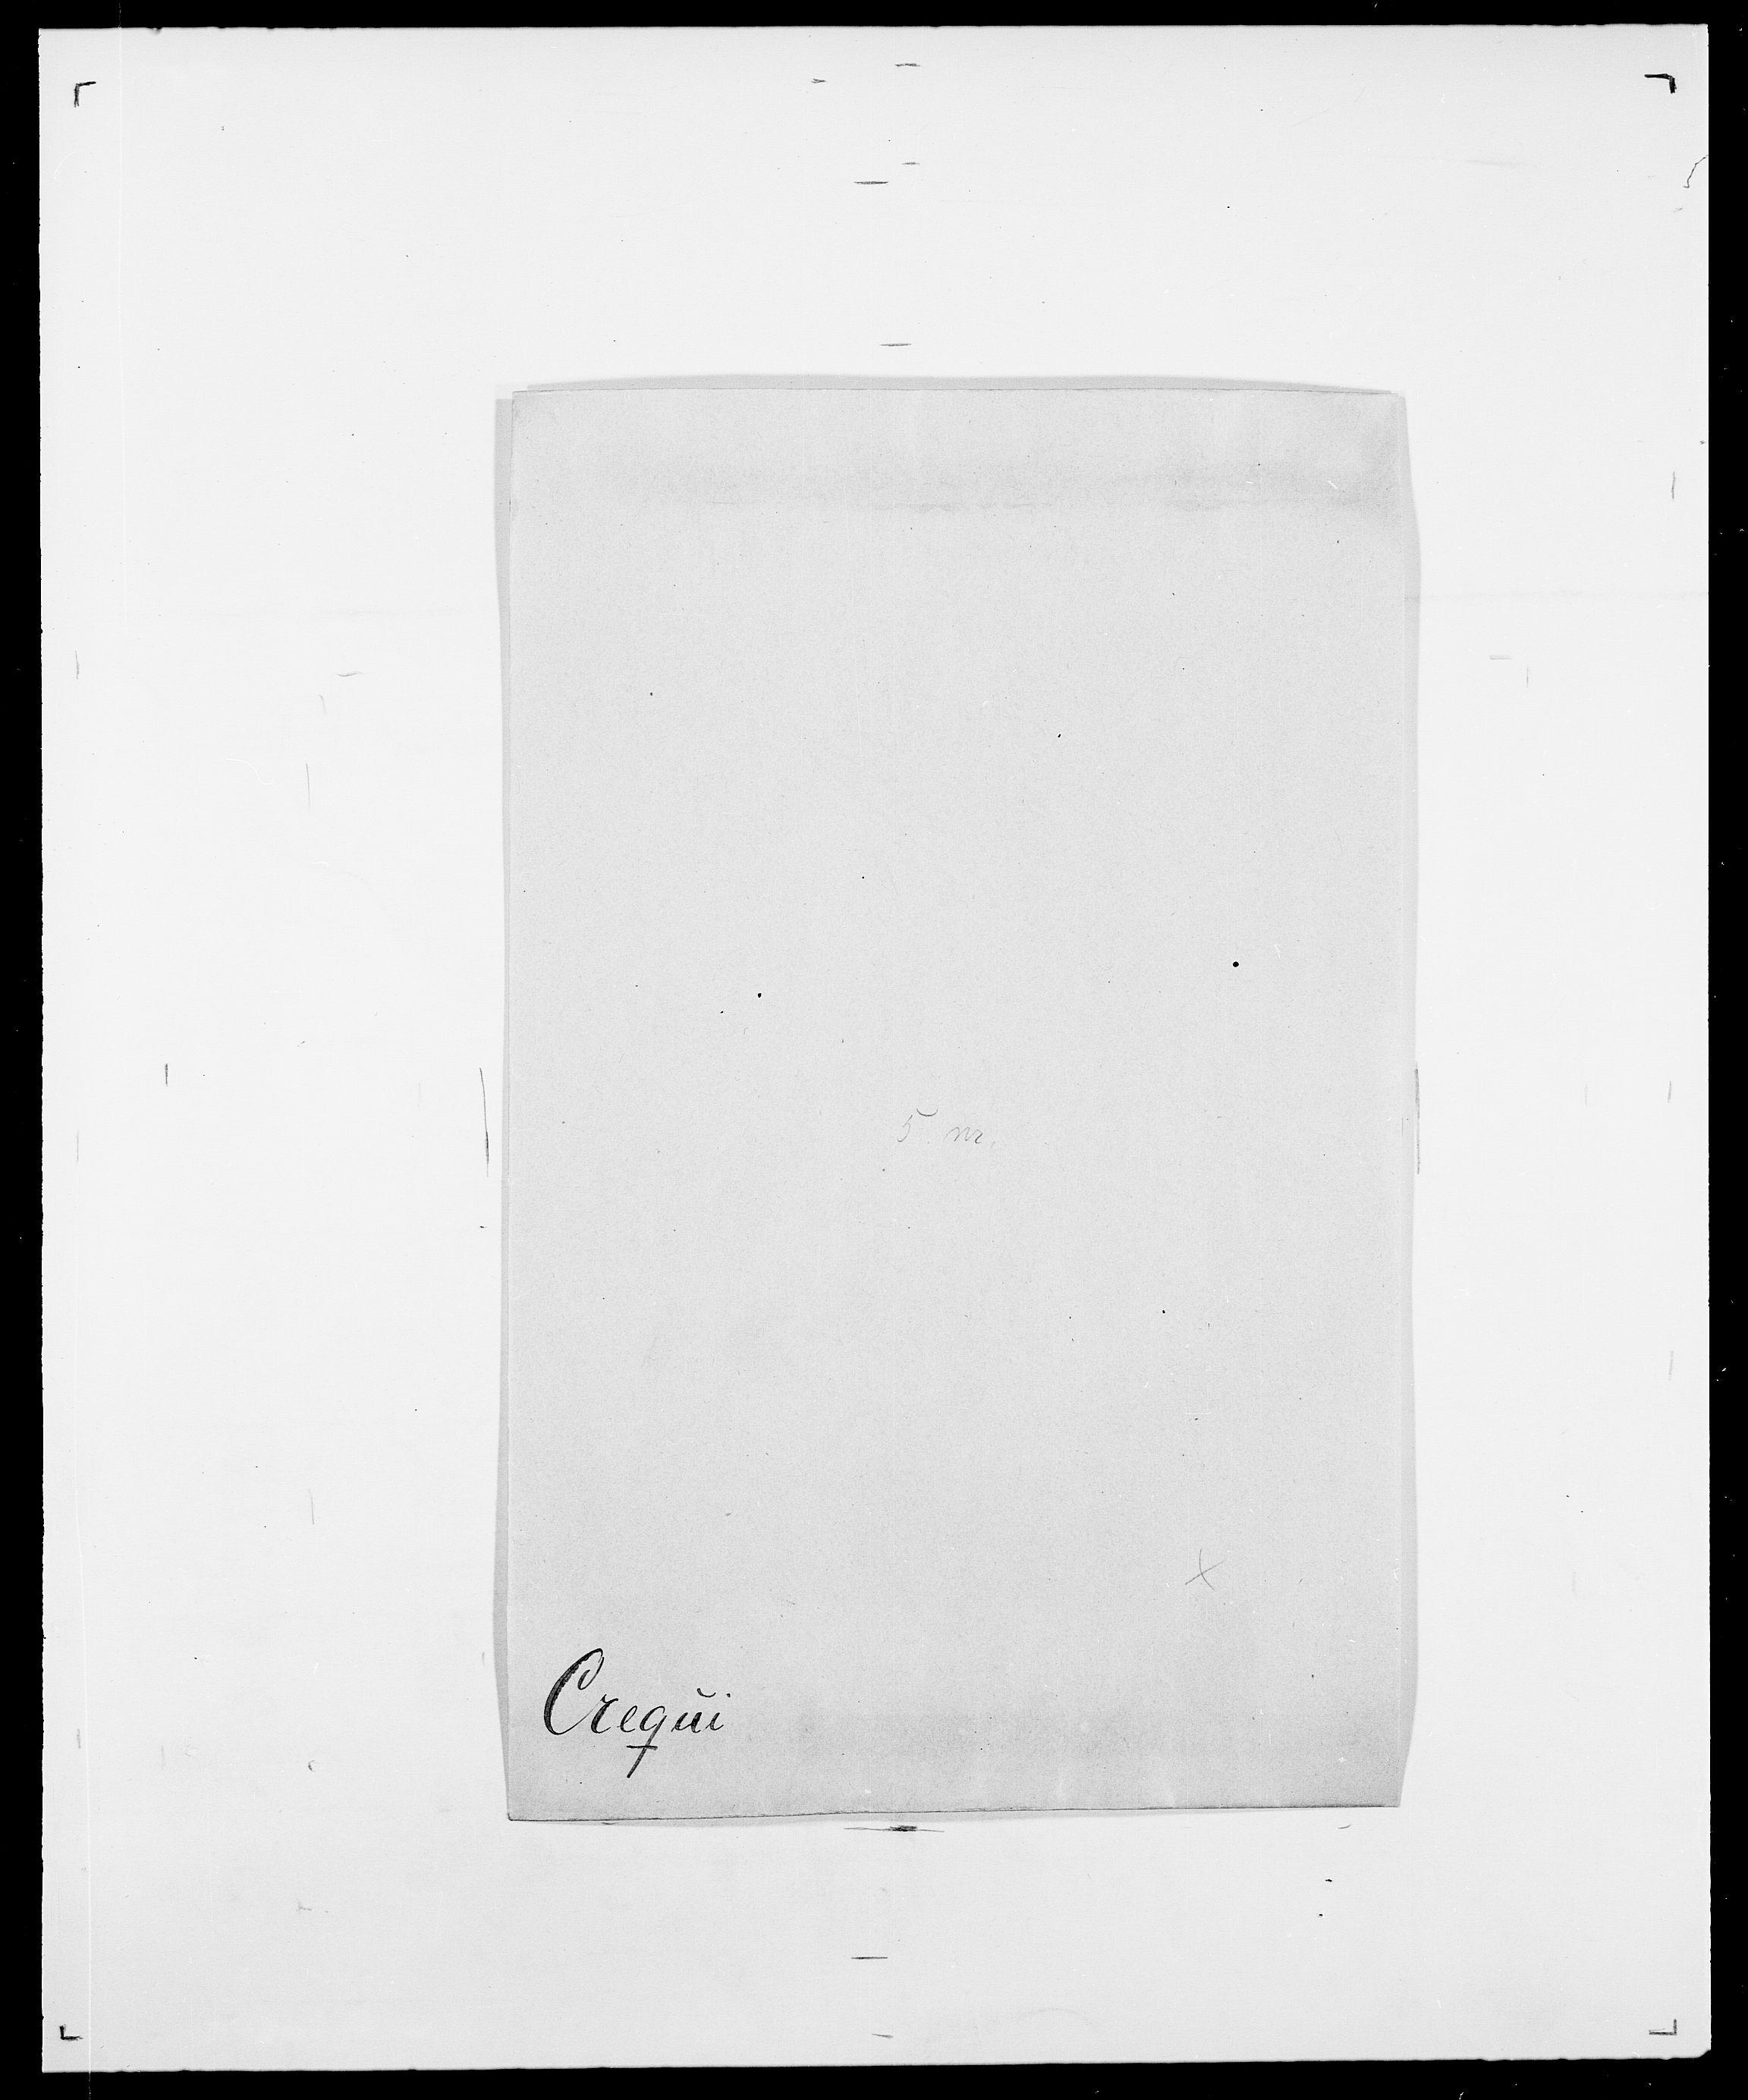 SAO, Delgobe, Charles Antoine - samling, D/Da/L0008: Capjon - Dagenbolt, s. 598